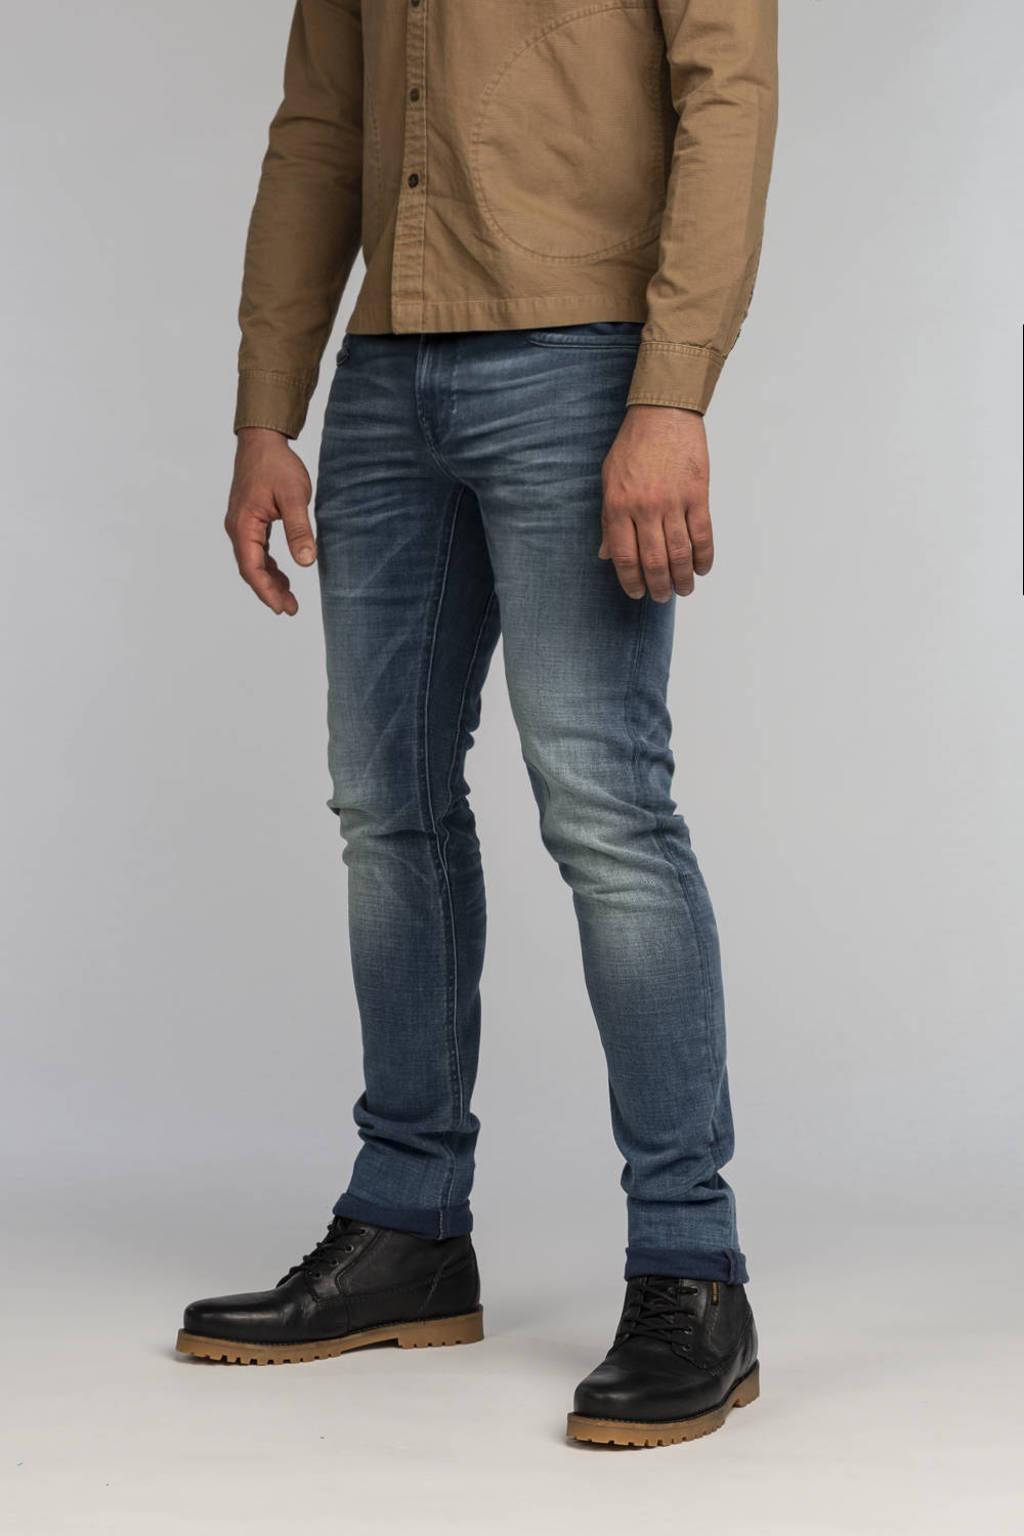 PME Legend slim fit jeans Tailwheel royal blue indigo, ROYAL BLUE INDIGO